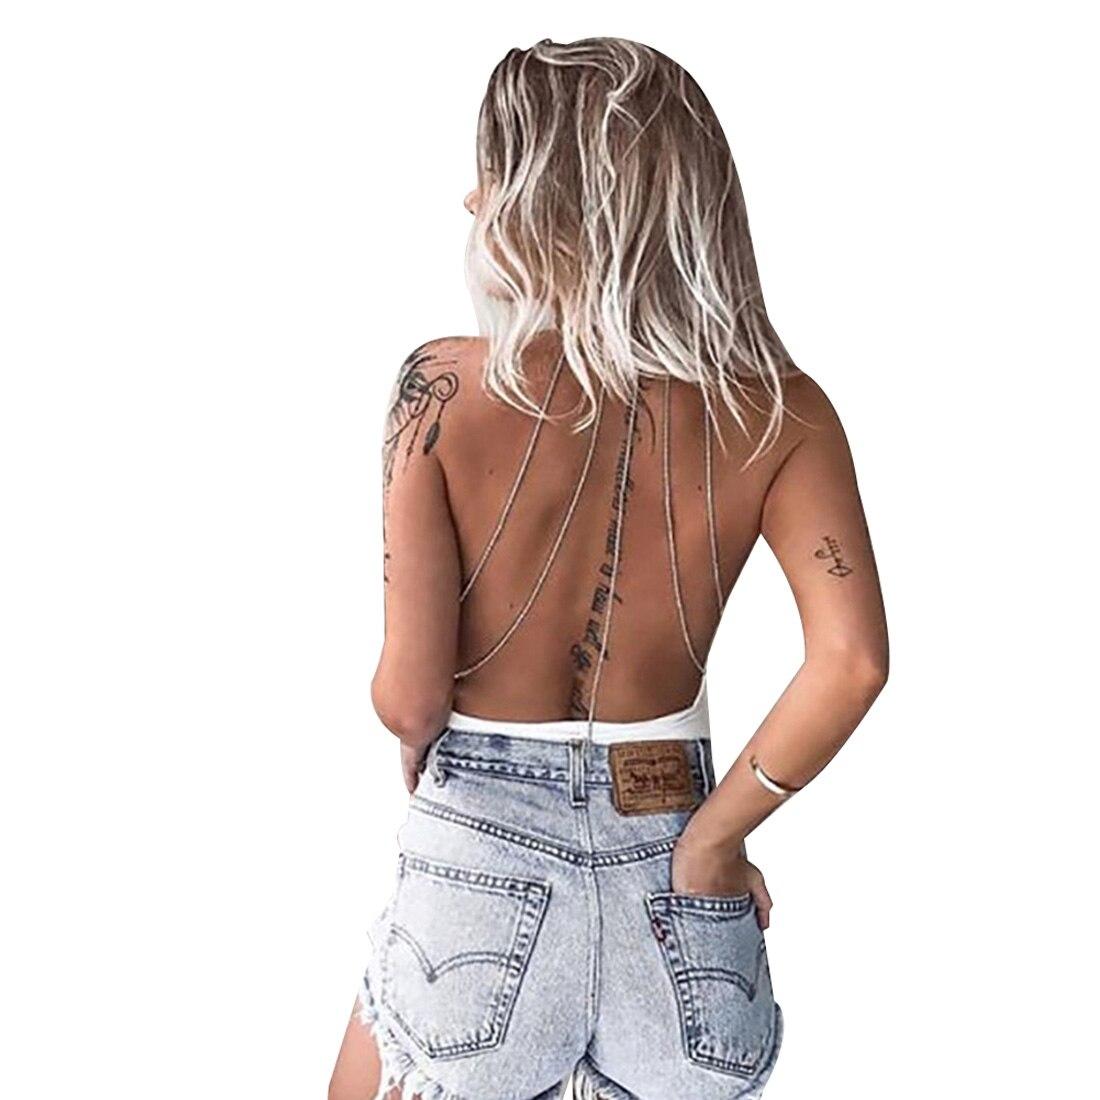 YJSFG HOUSE Summer Body Chain Slim Bodysuit Women Sexy Halter Neck Backless Jumpsuit Rompers Elegant Night Party Bodysuits 2017